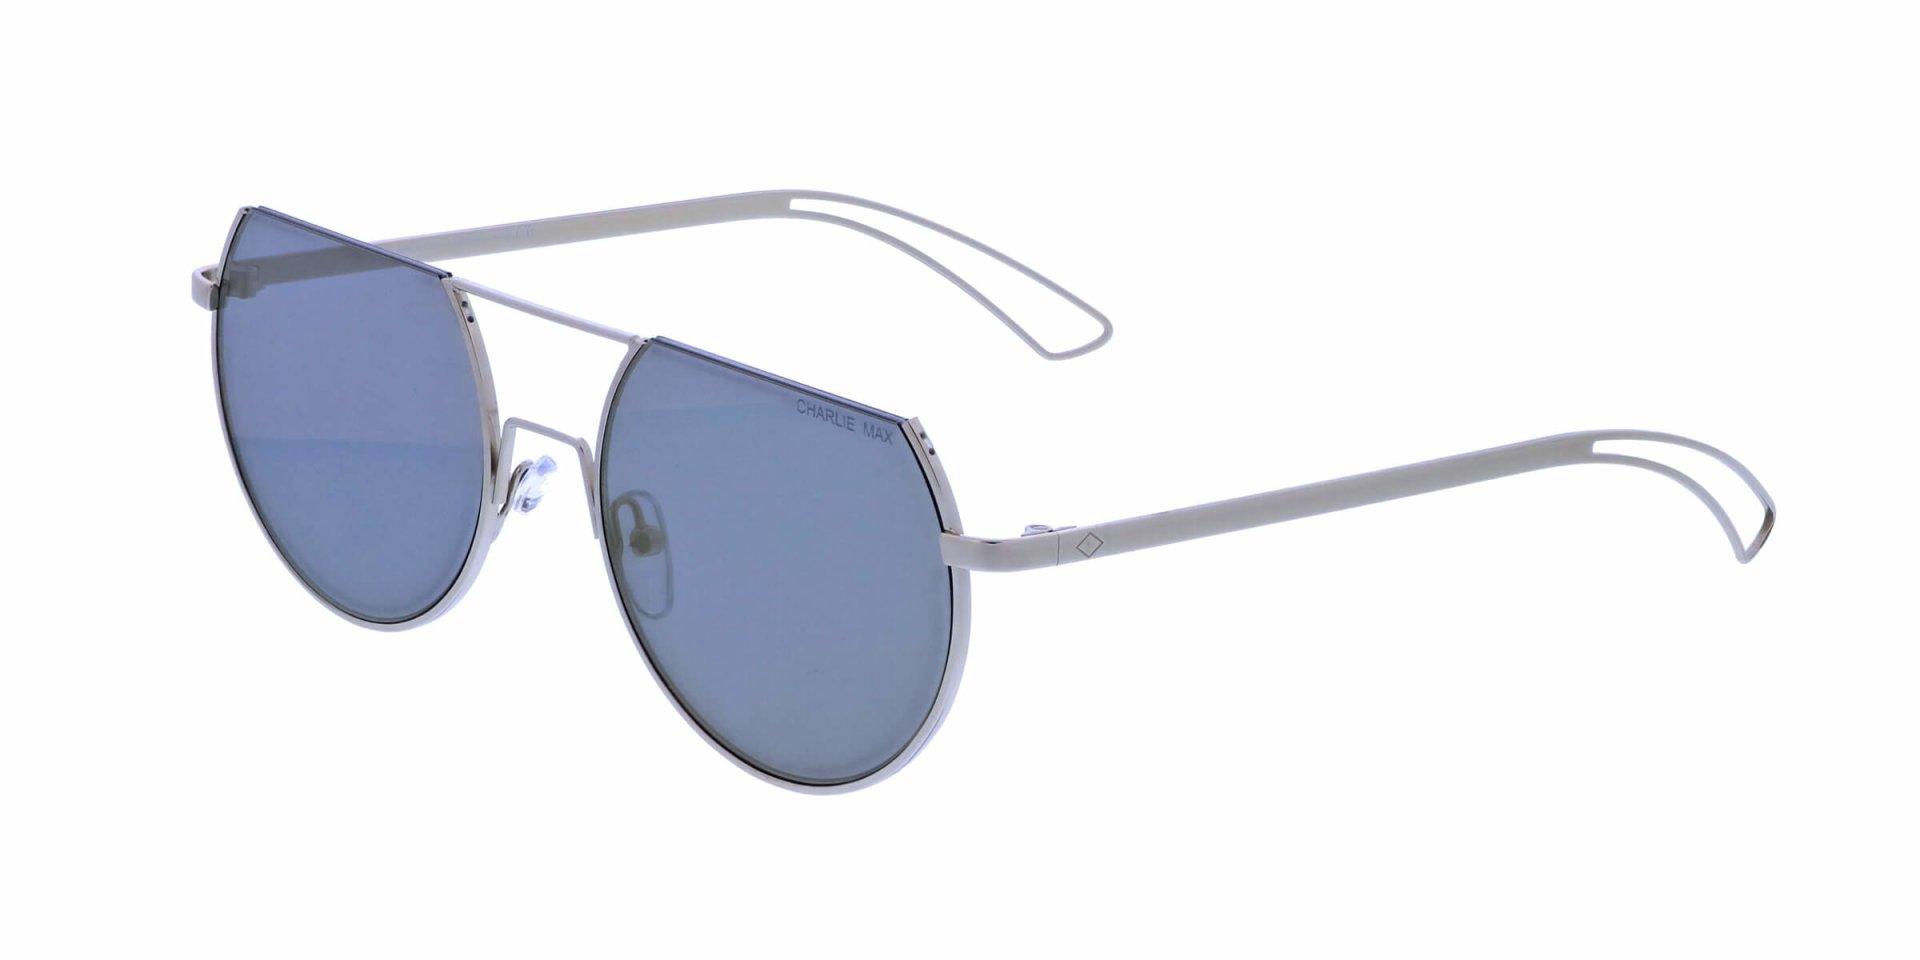 Sunglasses CHARLIE MAX MILANO   Opticlasa